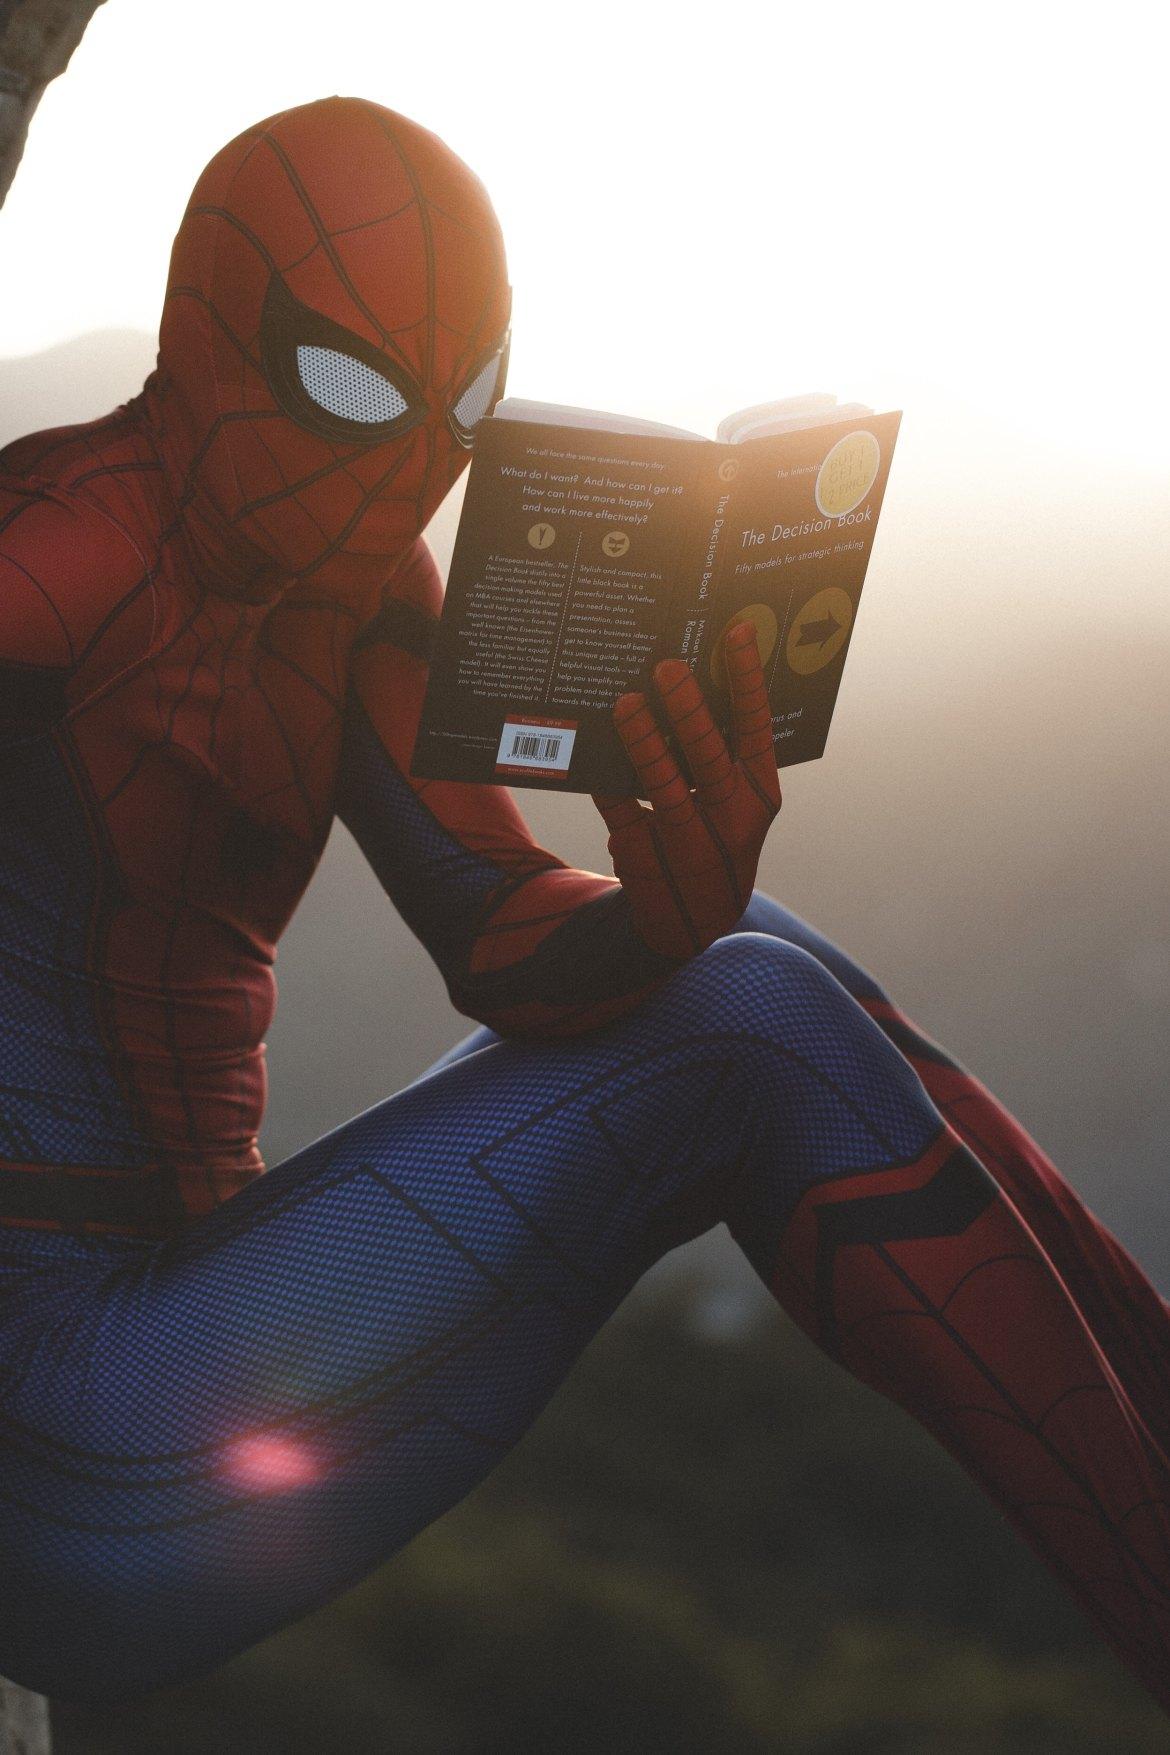 Storytelling vai além da 'Jornada do Herói'